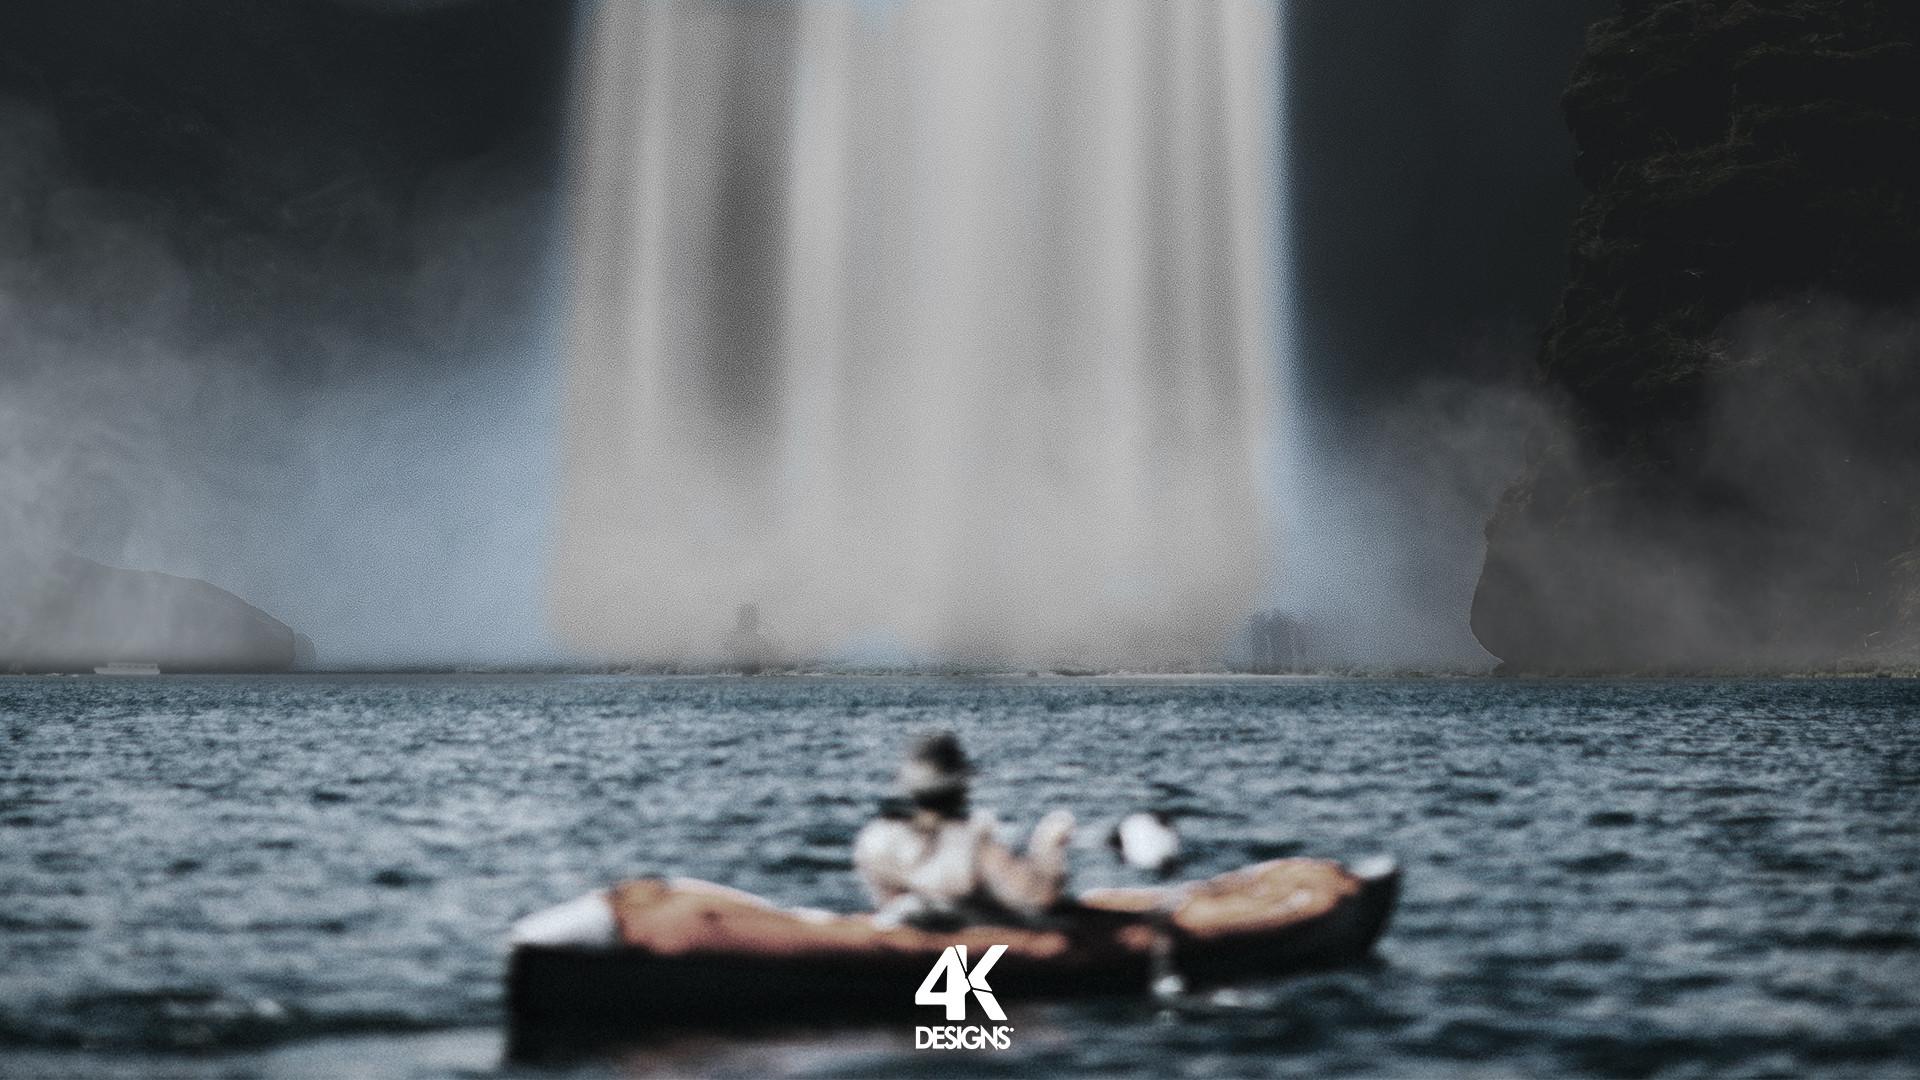 Lukas groh waterfall